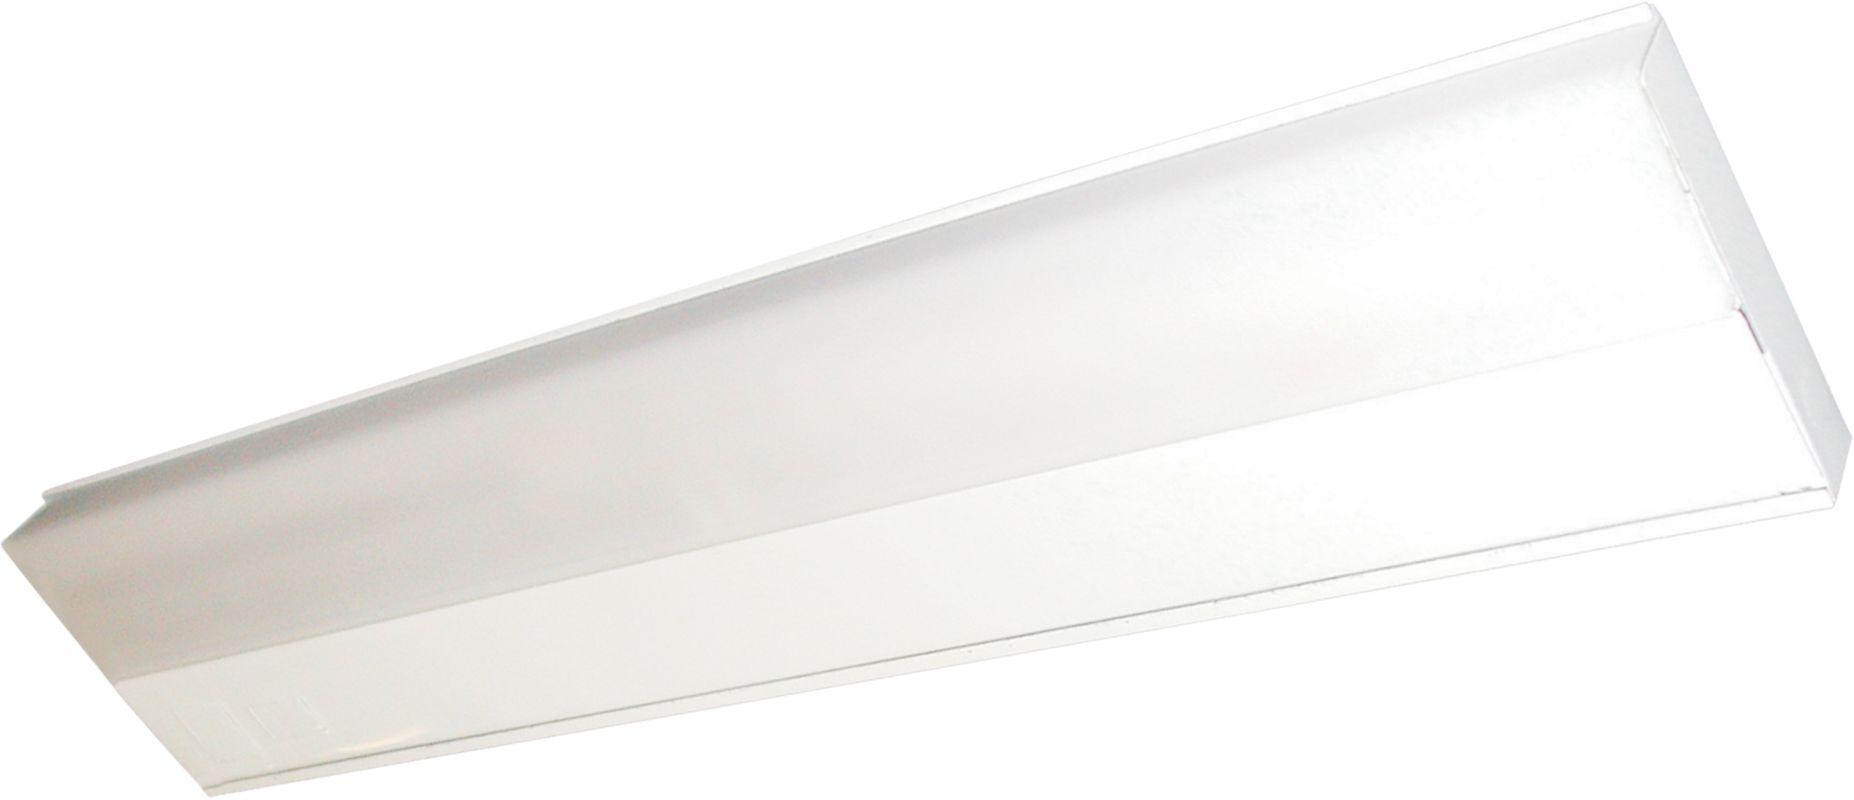 "Maxim 87809 1 Light 43"" Fluorescent Under Cabinet Light from the"